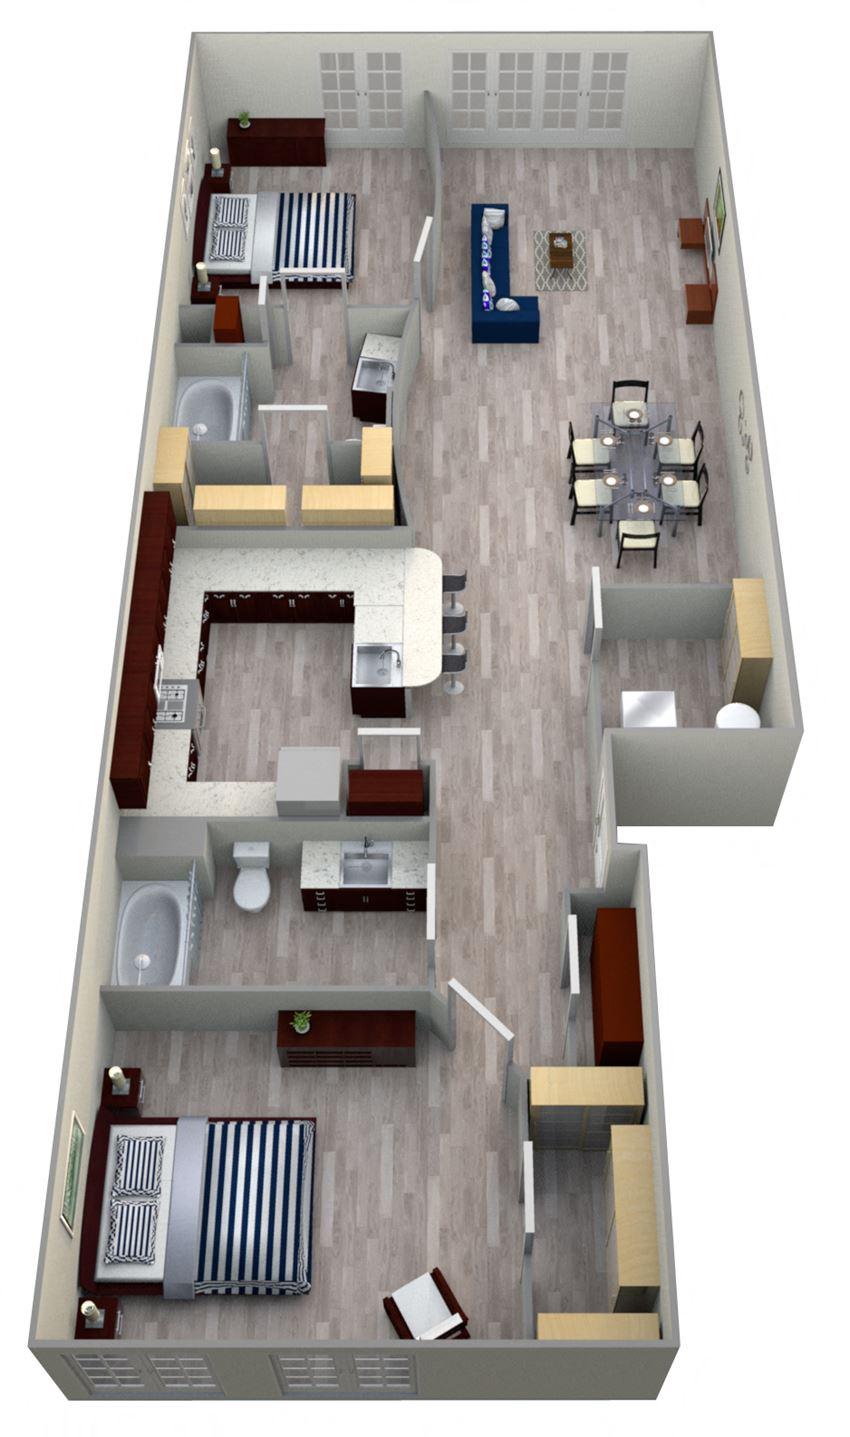 2 Bed 2 Bath 9B2 - LOFTS Floor Plan at The Landmark, New Braunfels, TX